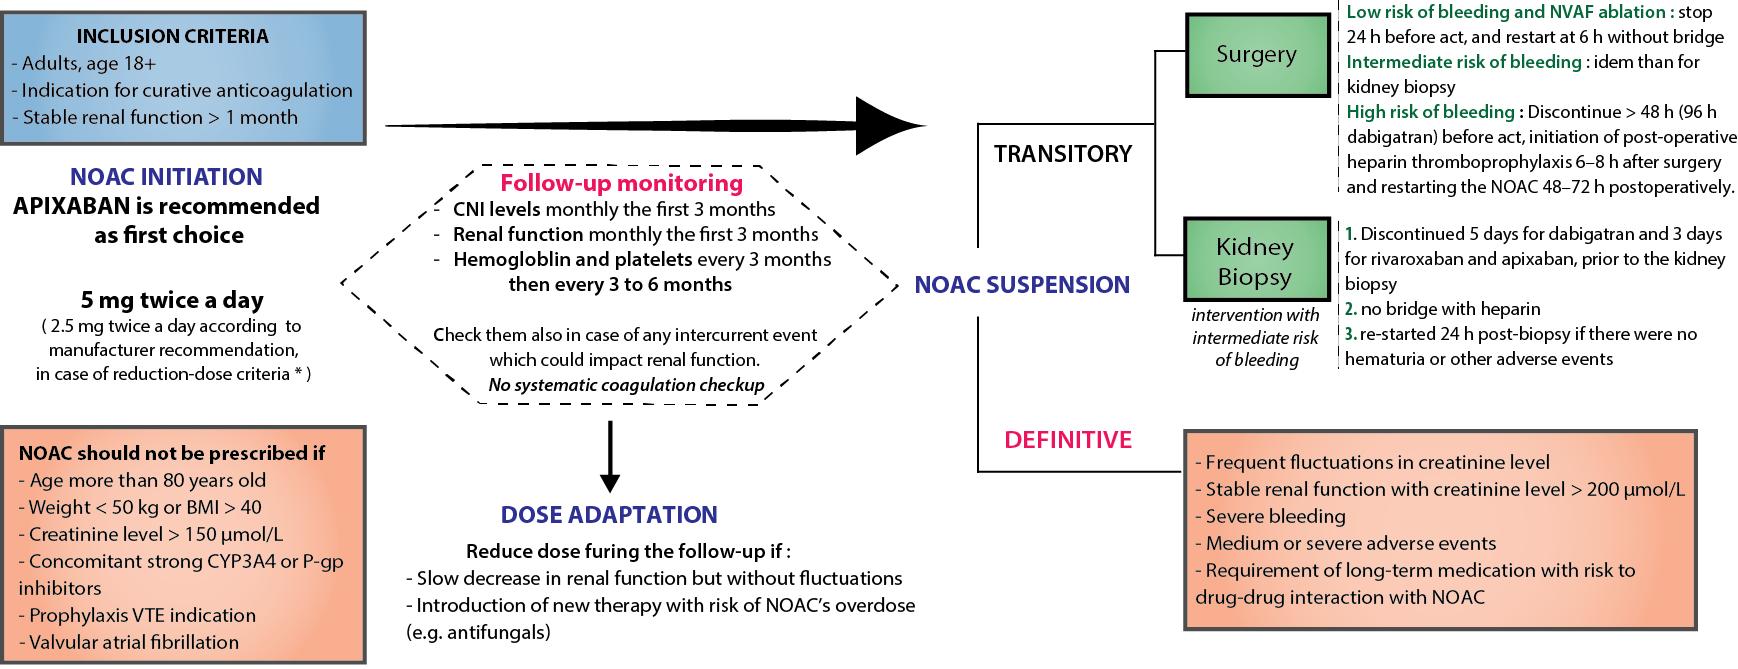 Novel Oral Anticoagulants in Kidney Transplantation: Results